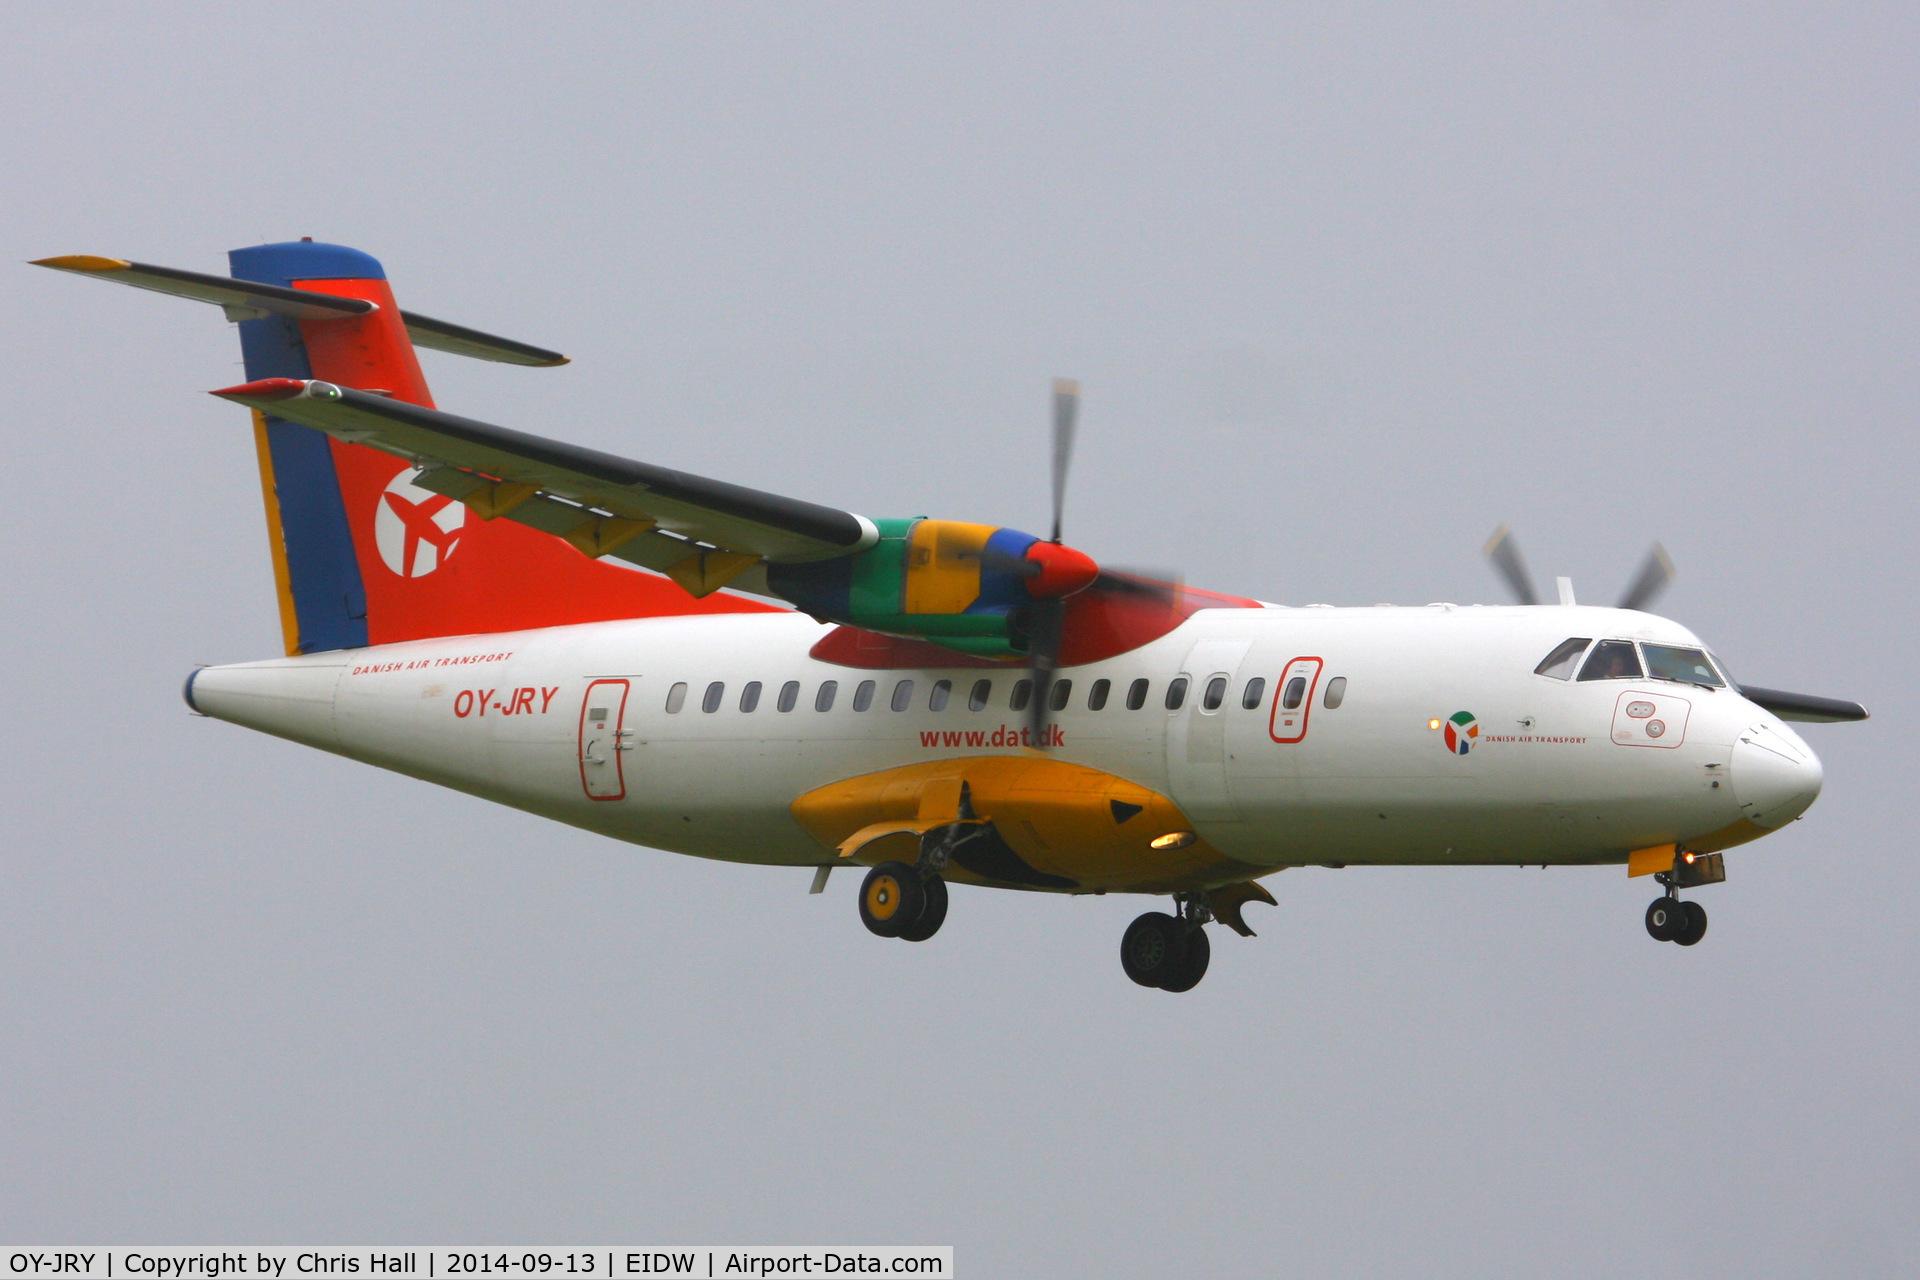 OY-JRY, 1987 ATR 42-320 C/N 063, Danish Air Transport